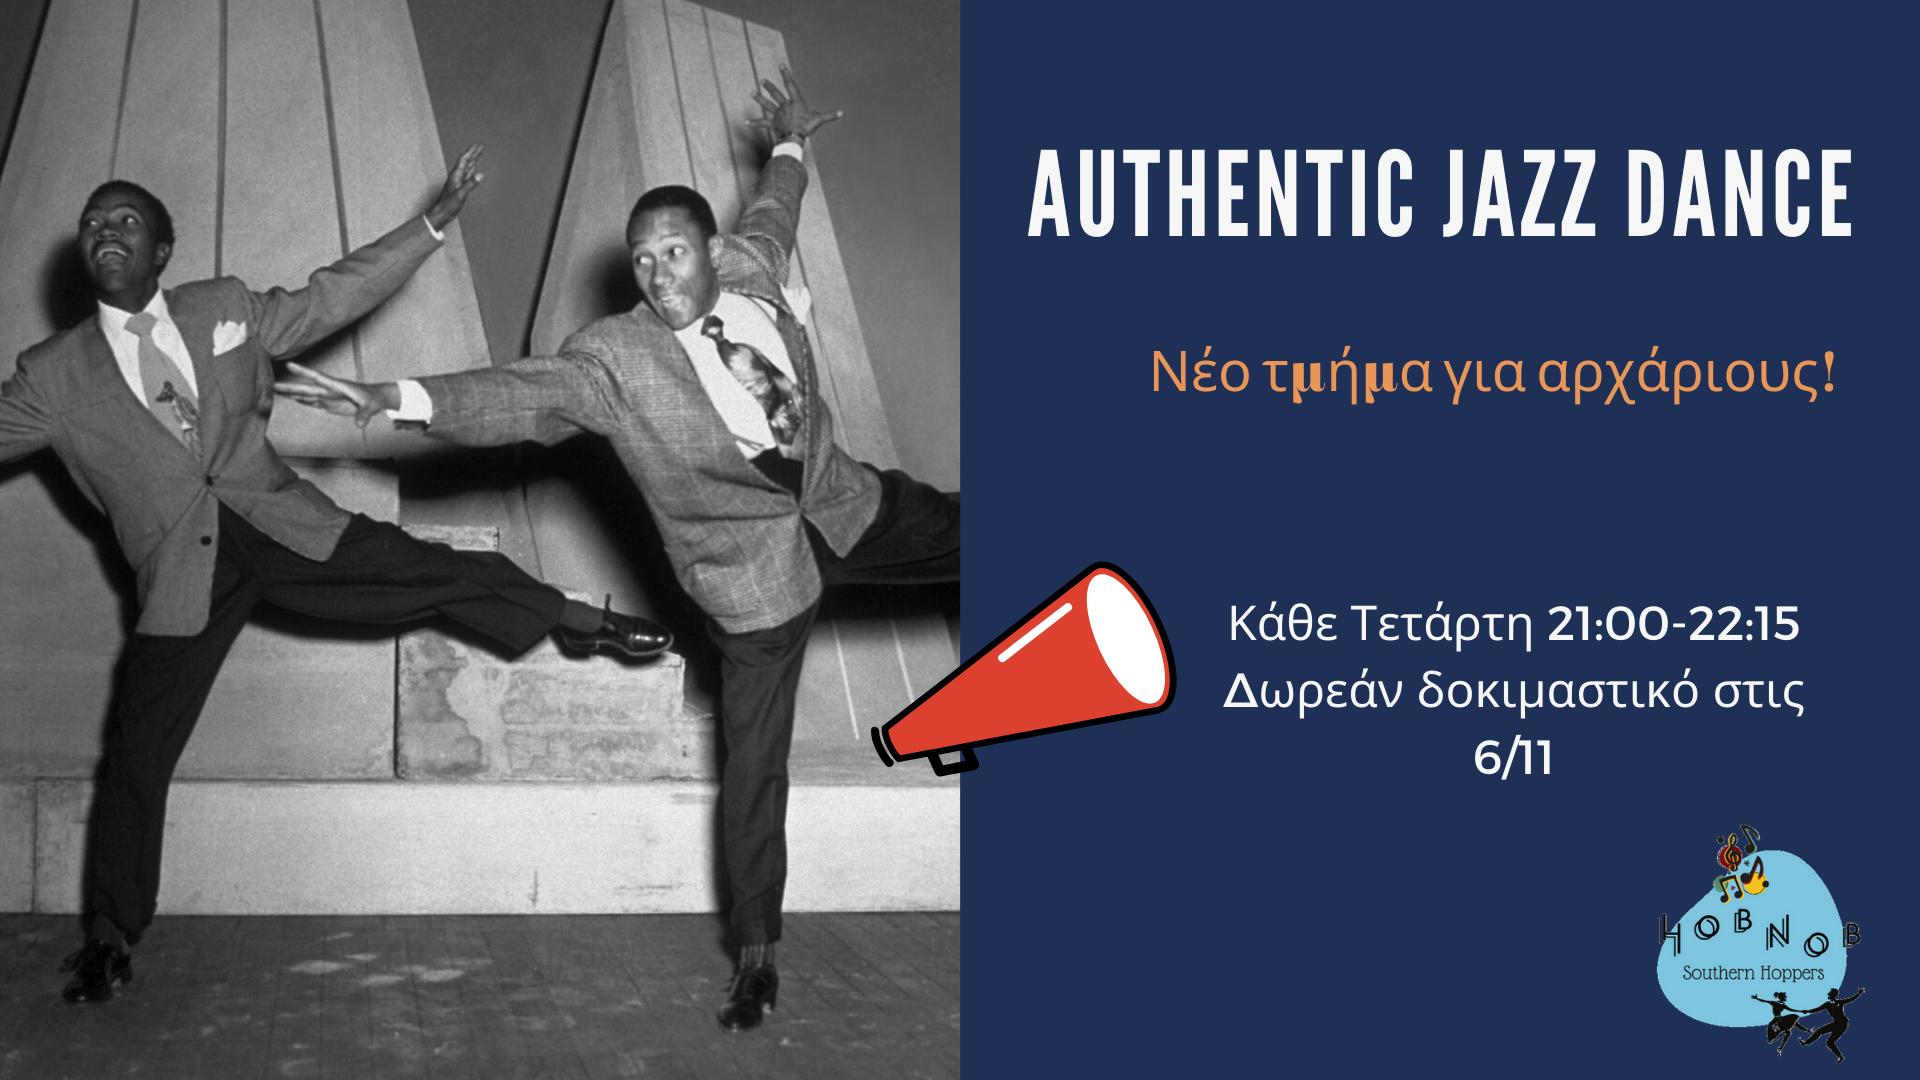 Authentic jazz dance μάθημα γνωριμίας και νέο τμήμα αρχαρίων